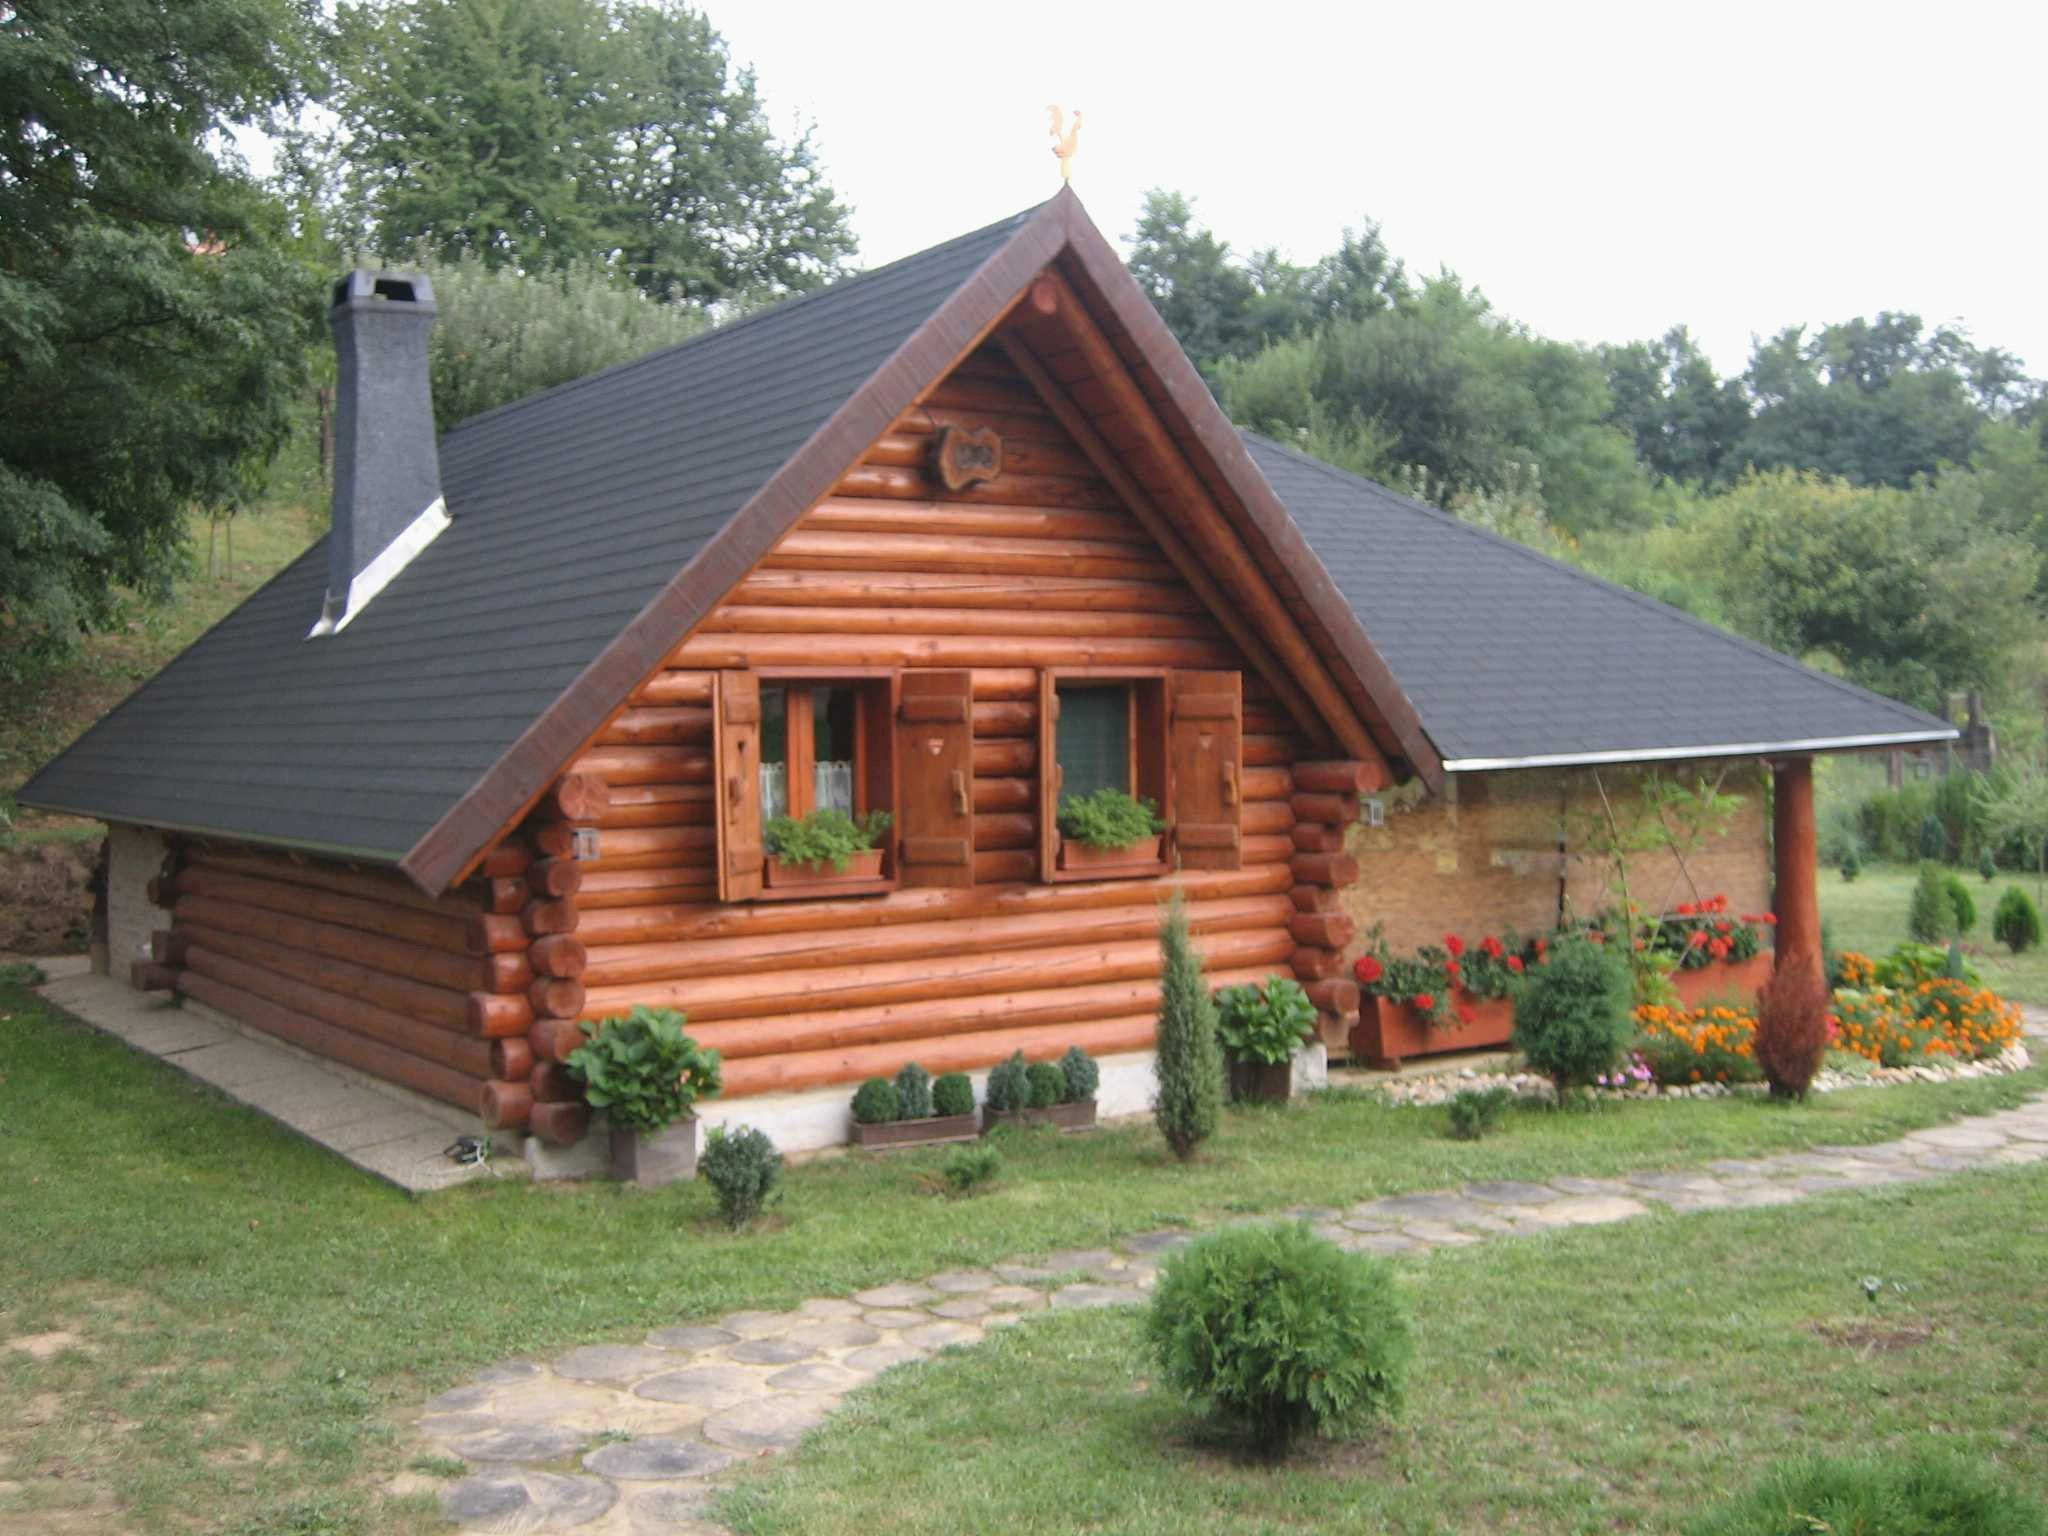 29 Unique Lake House Plans With Walkout Basement Basement House Lake Plans Unique In 2020 Minecraft House Designs Small Log Cabin Houses Log Cabin Floor Plans